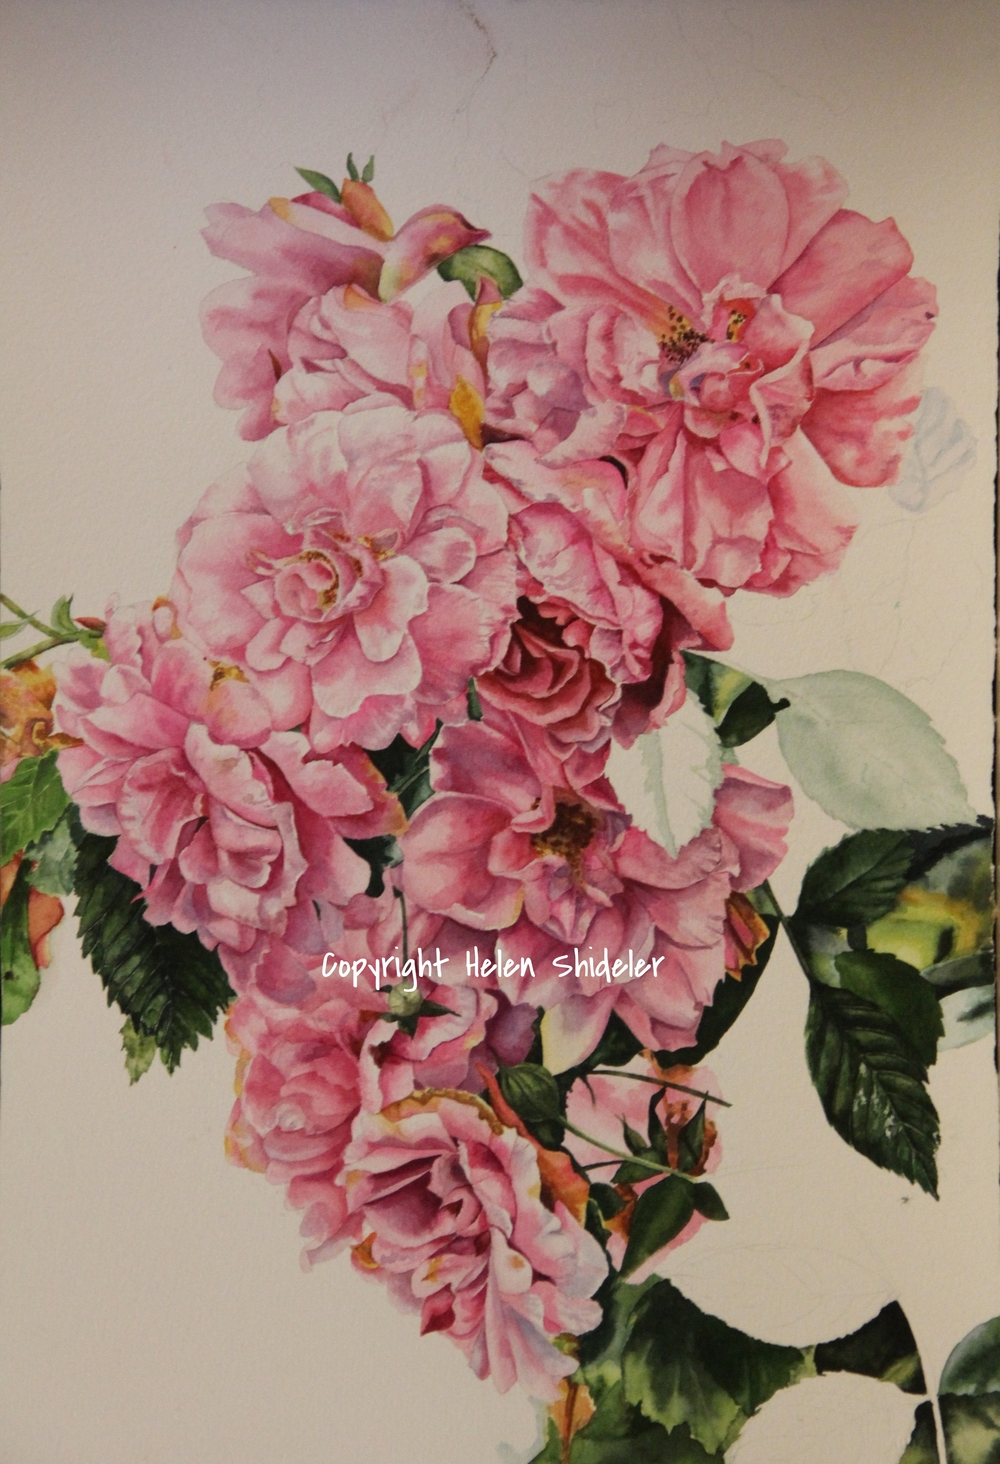 Cascading Blooms by Helen Shideler